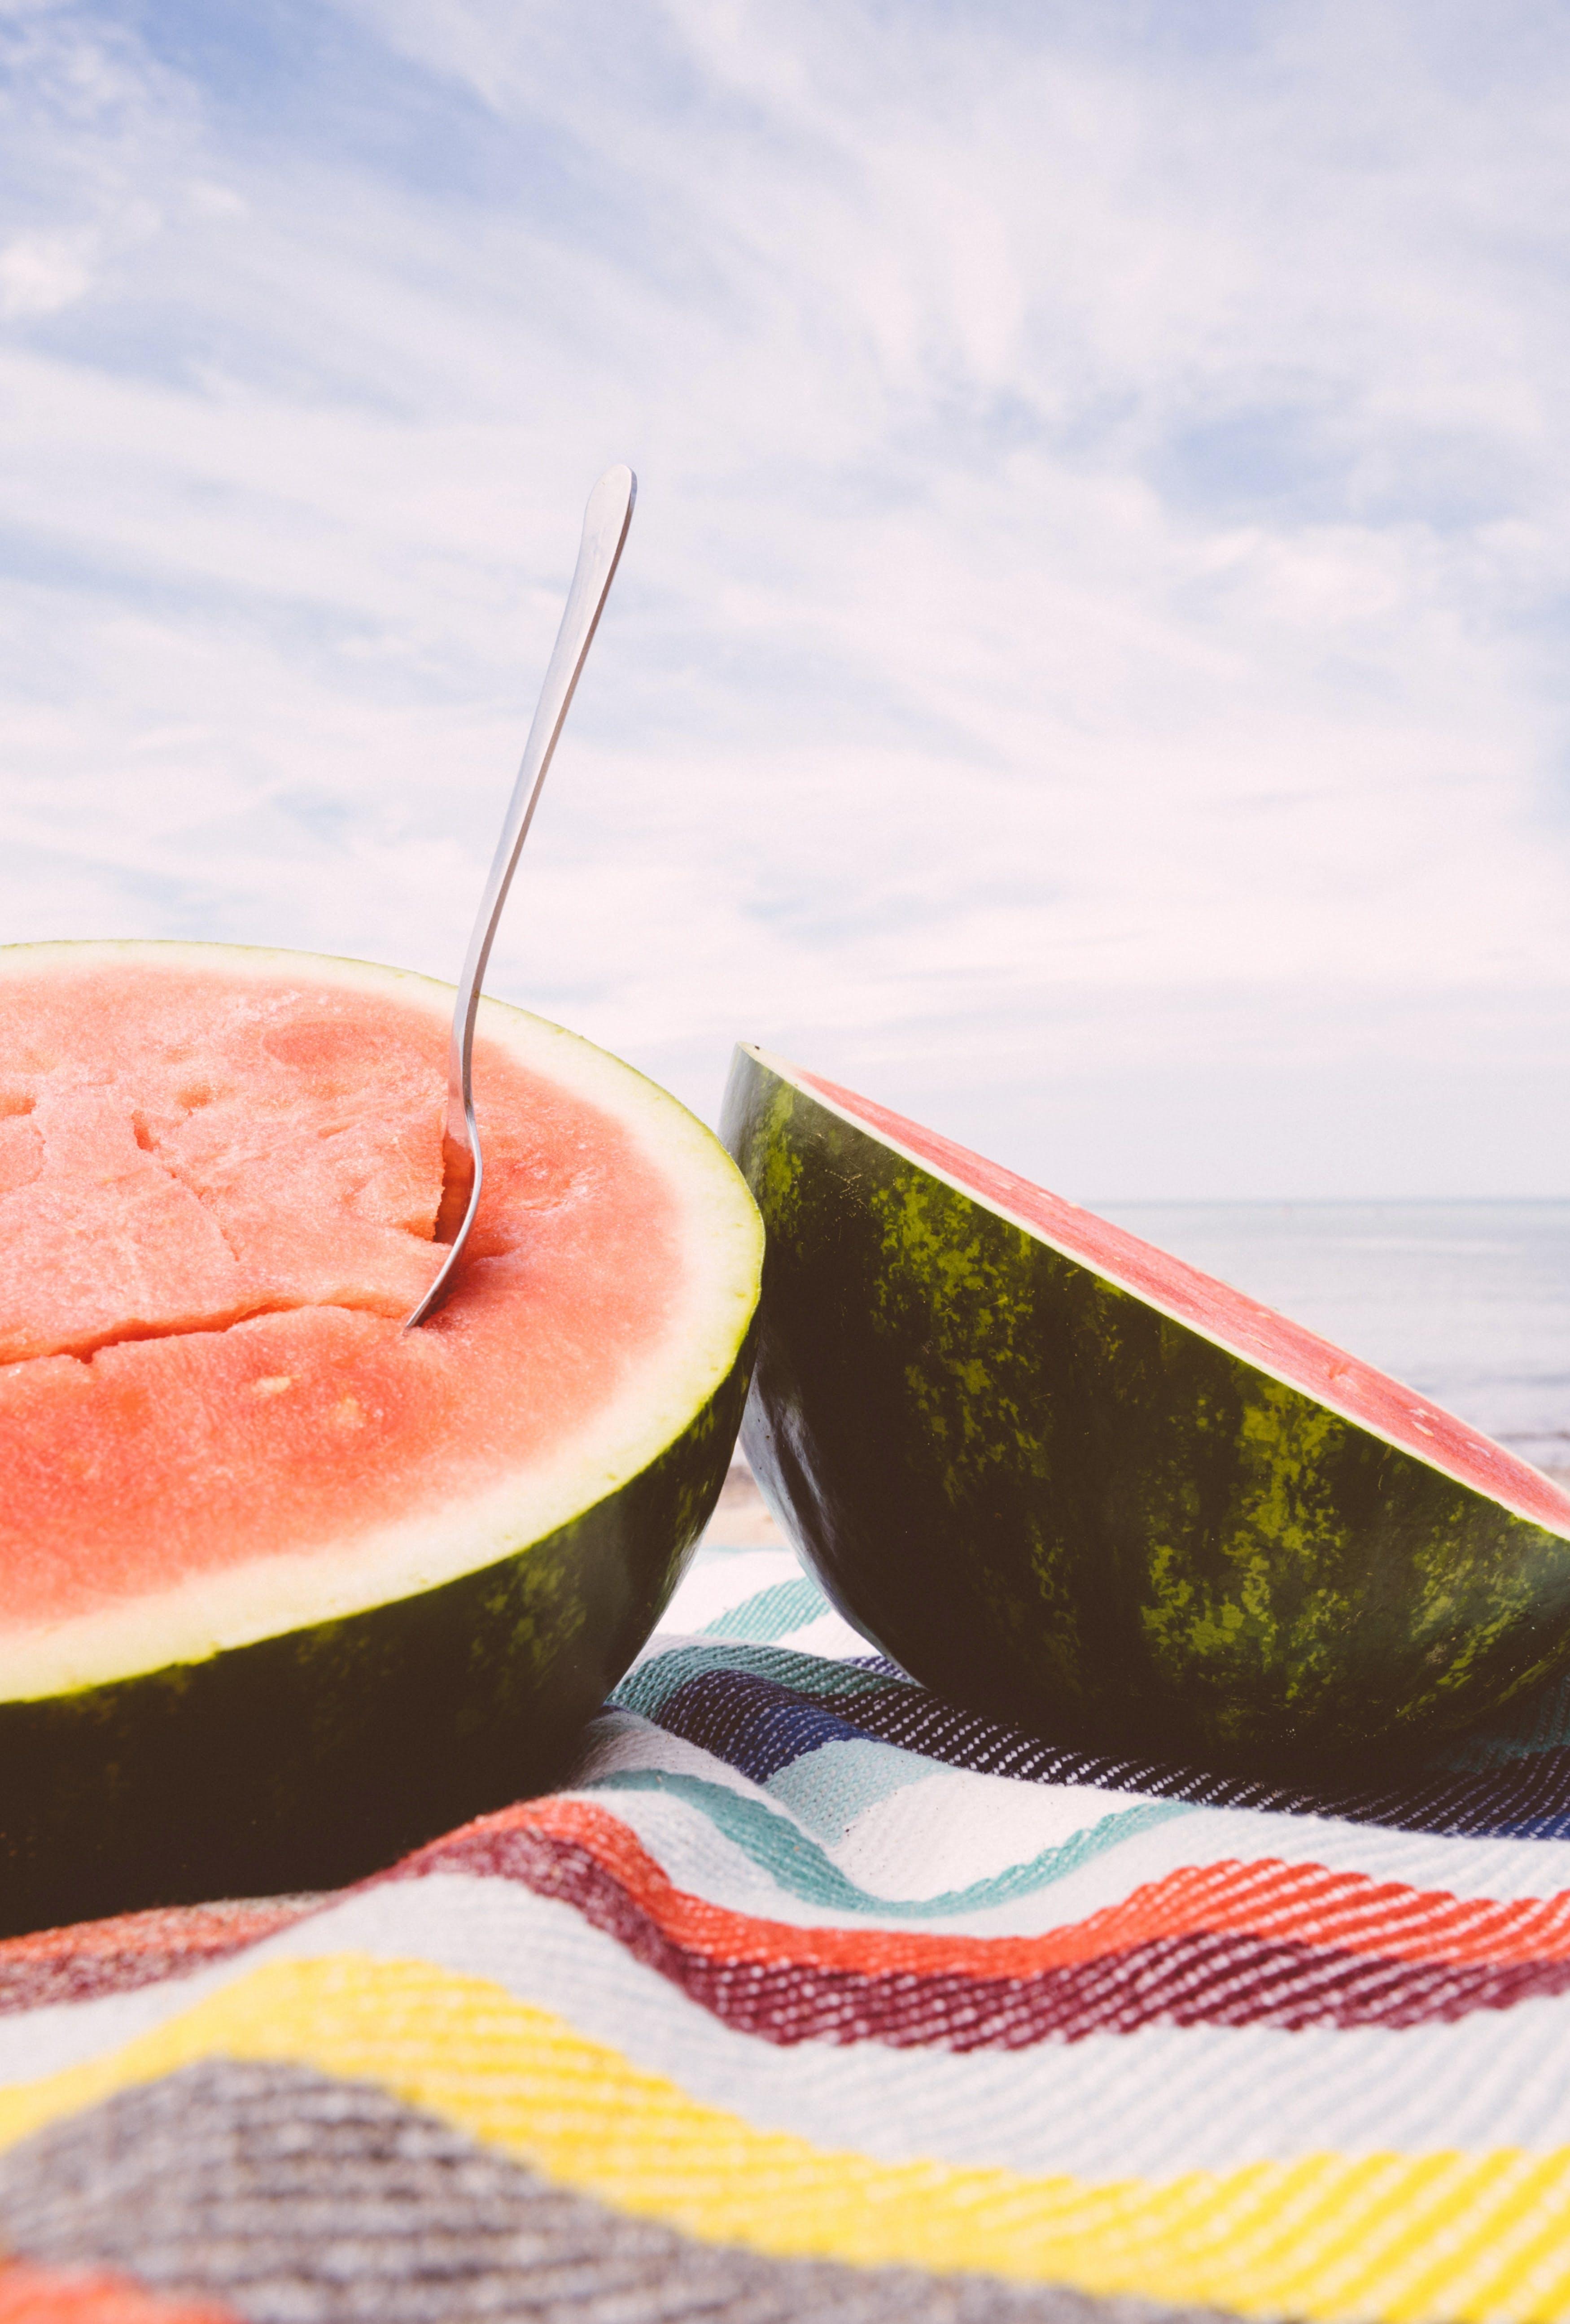 Photo of Sliced Watermelon